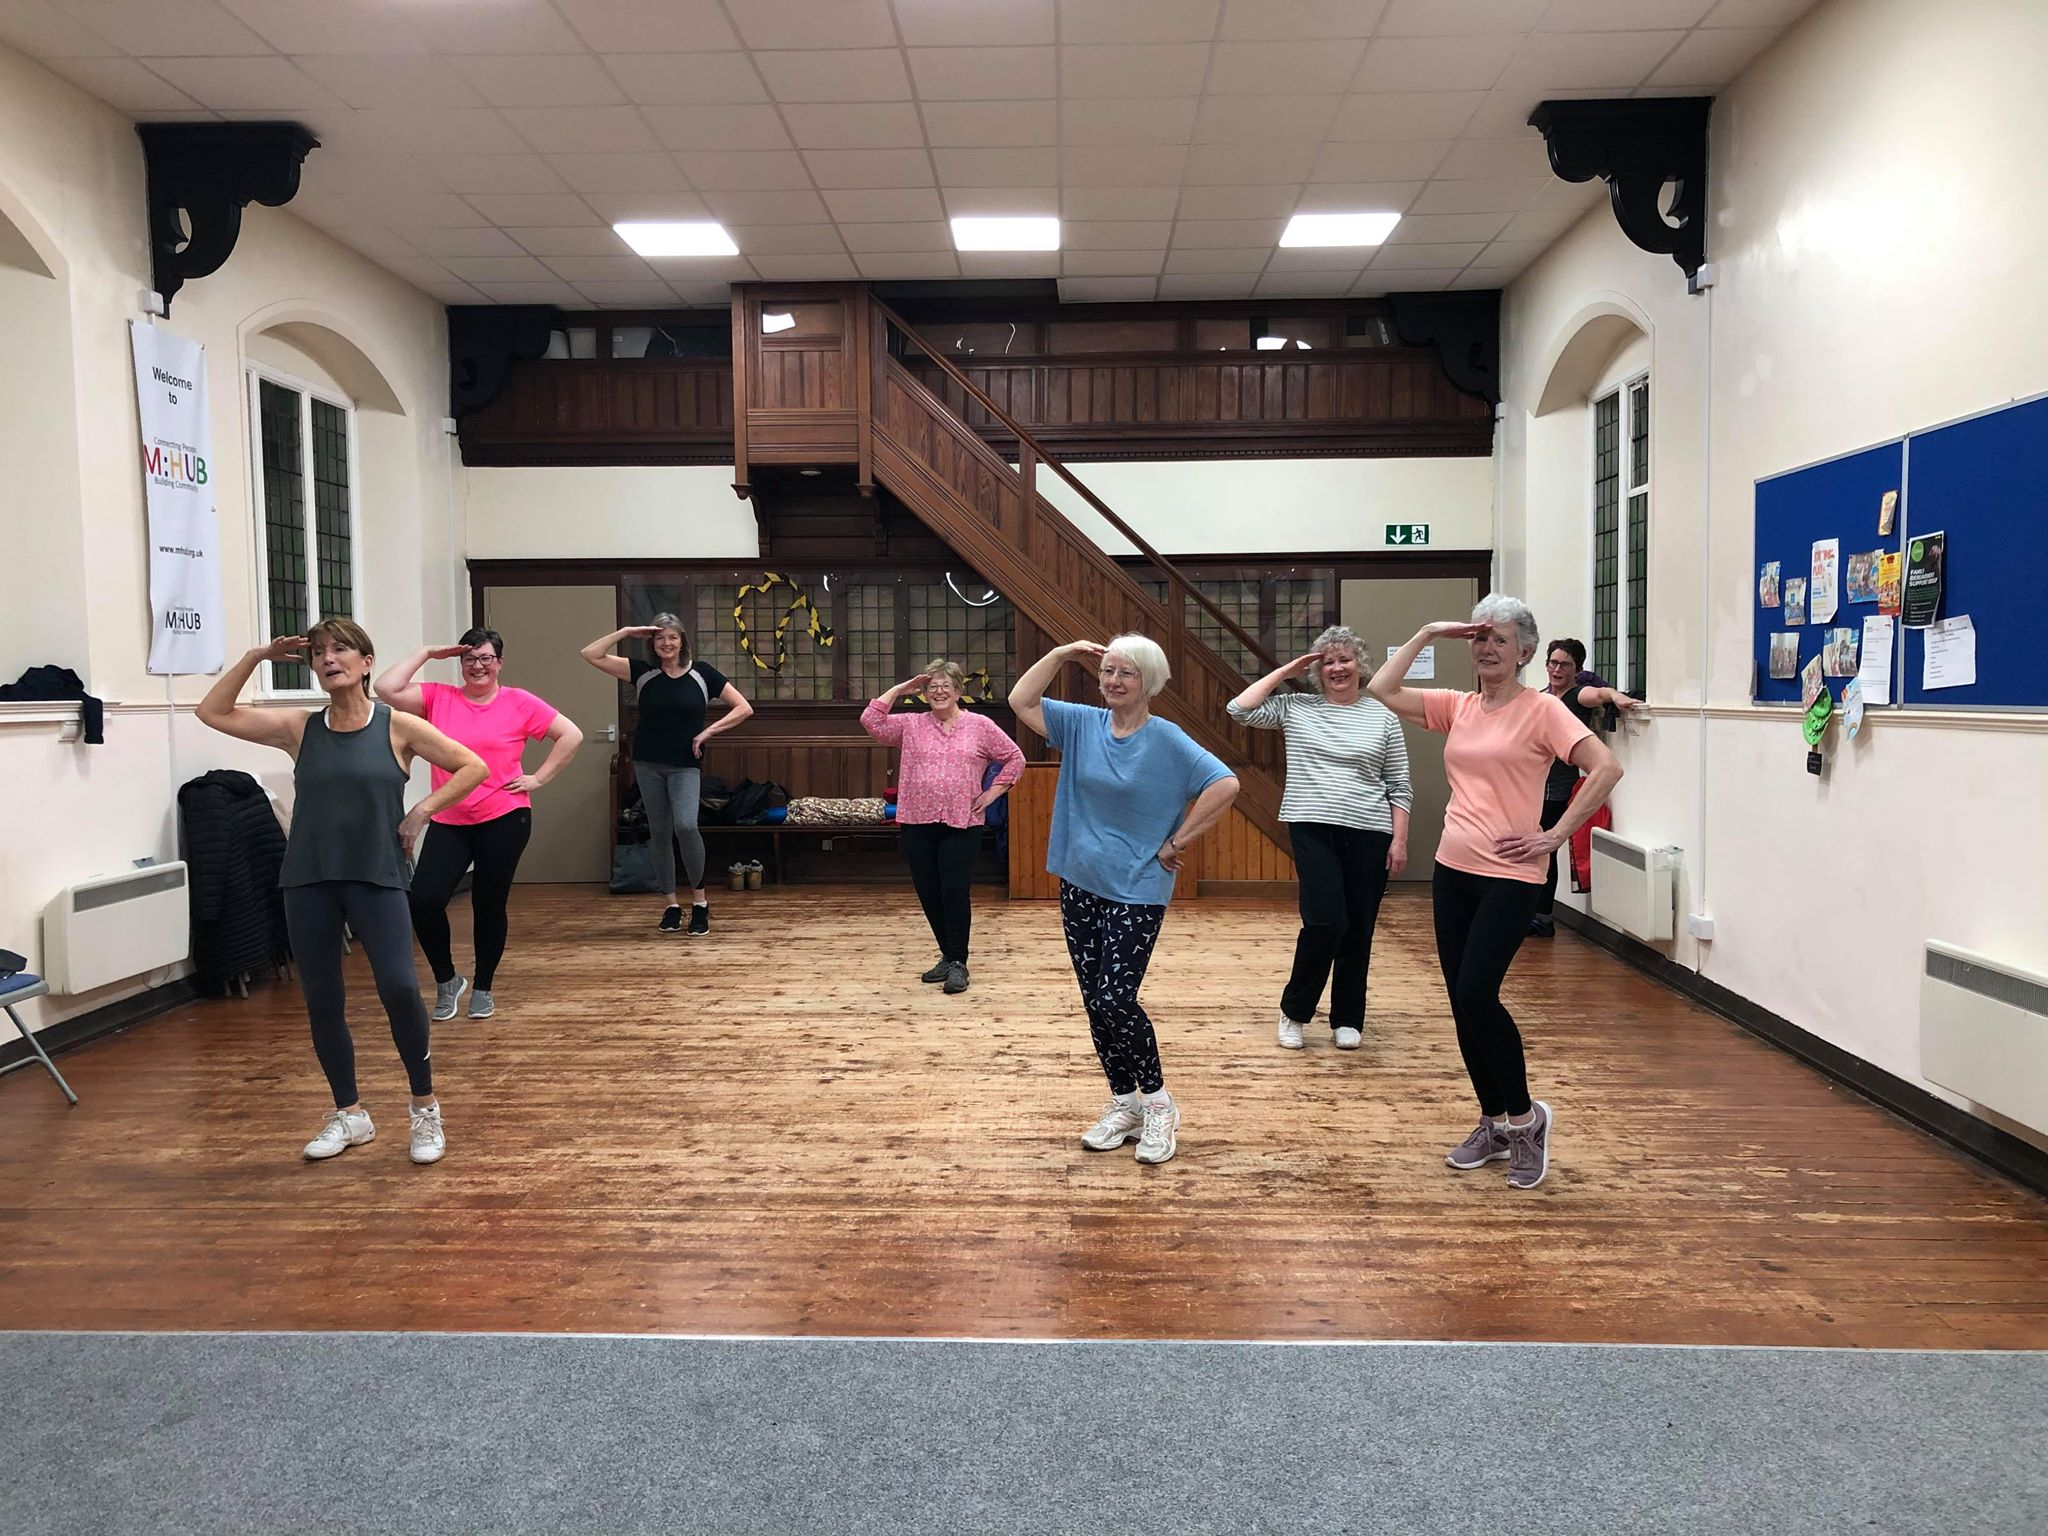 M:HUB Dance Fitness